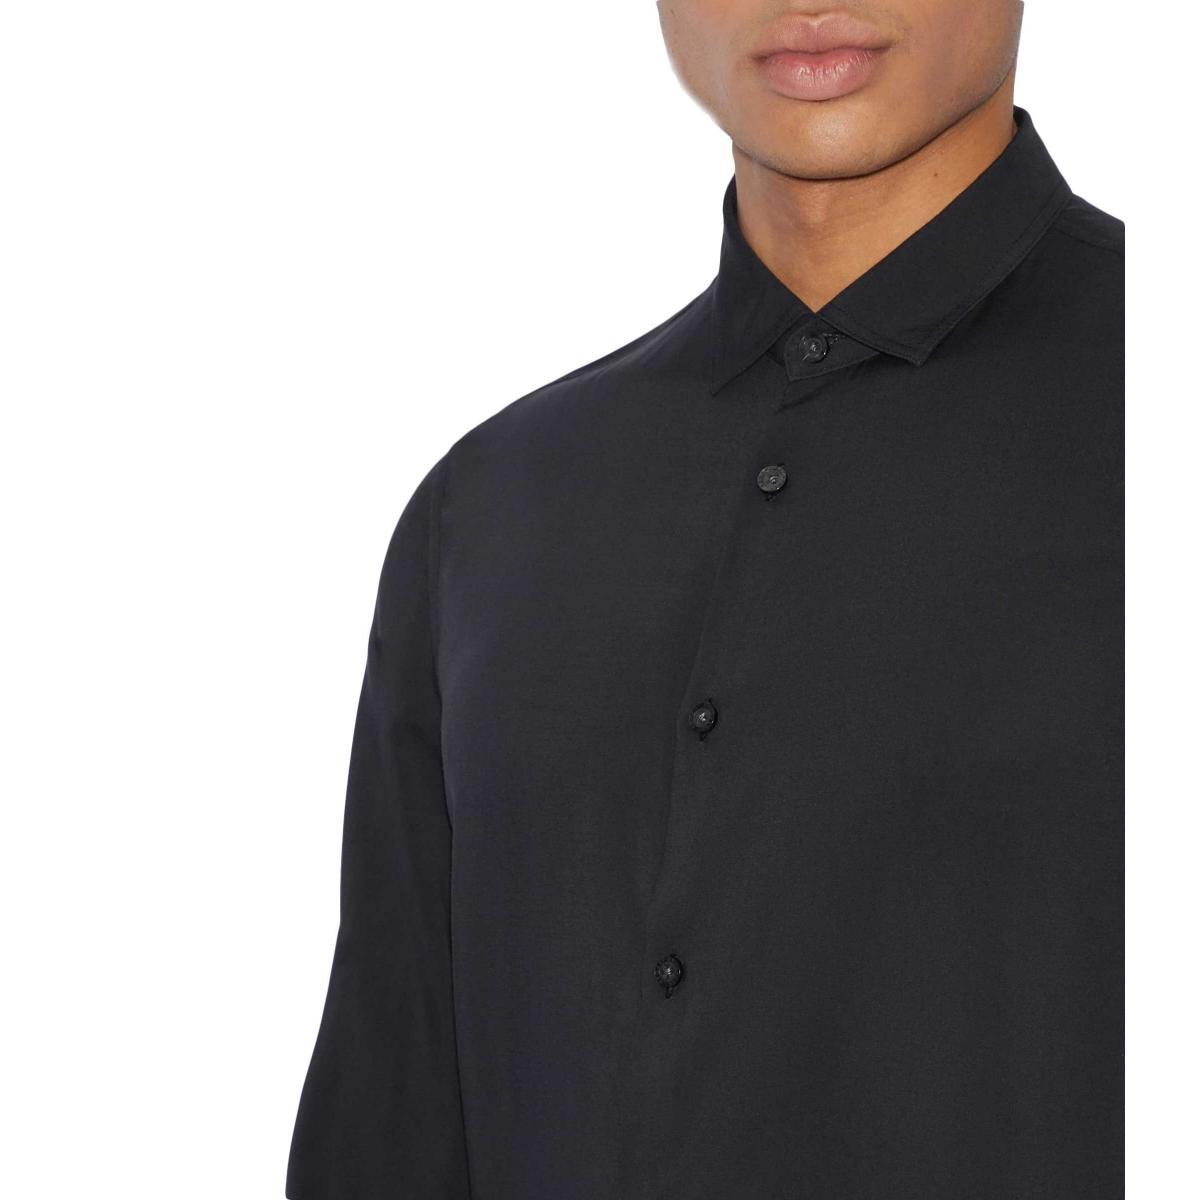 Camicia Armani Exchange slim fit da uomo rif. 3GZC03 ZNFUZ